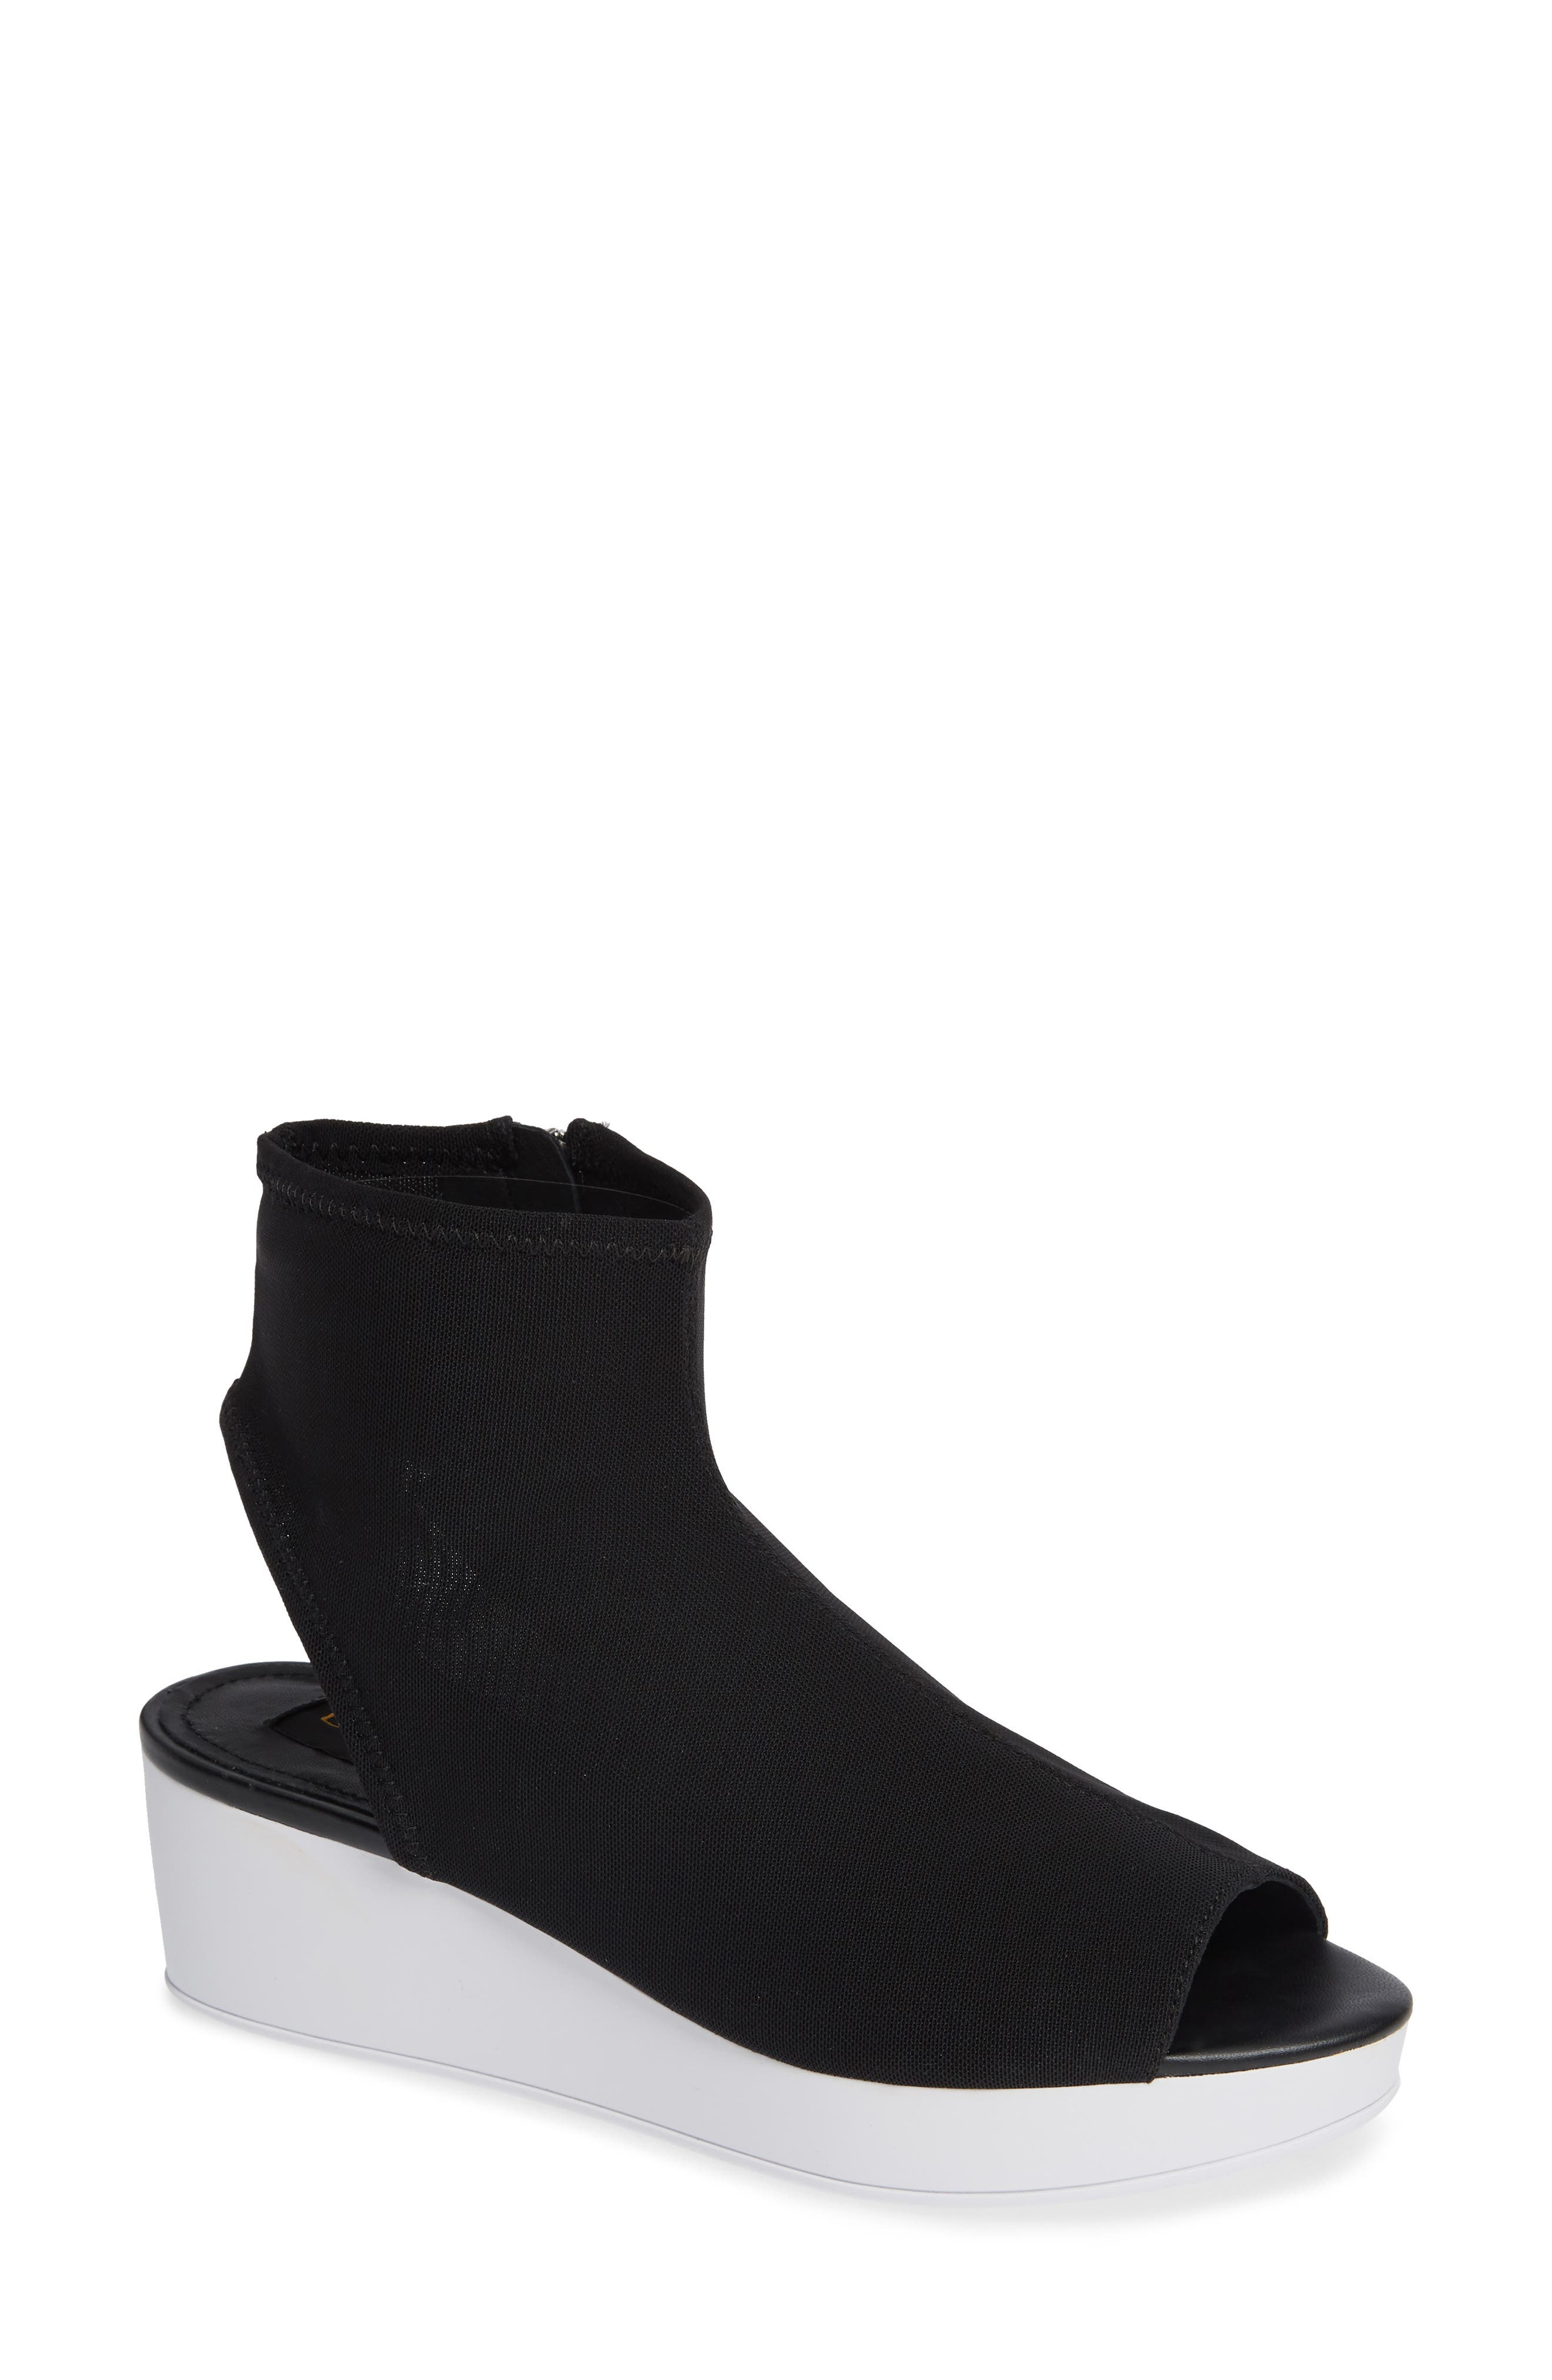 Donna Karan Rivera Mid-Wedge Sandal,                             Main thumbnail 1, color,                             BLACK STRETCH FLY KNIT